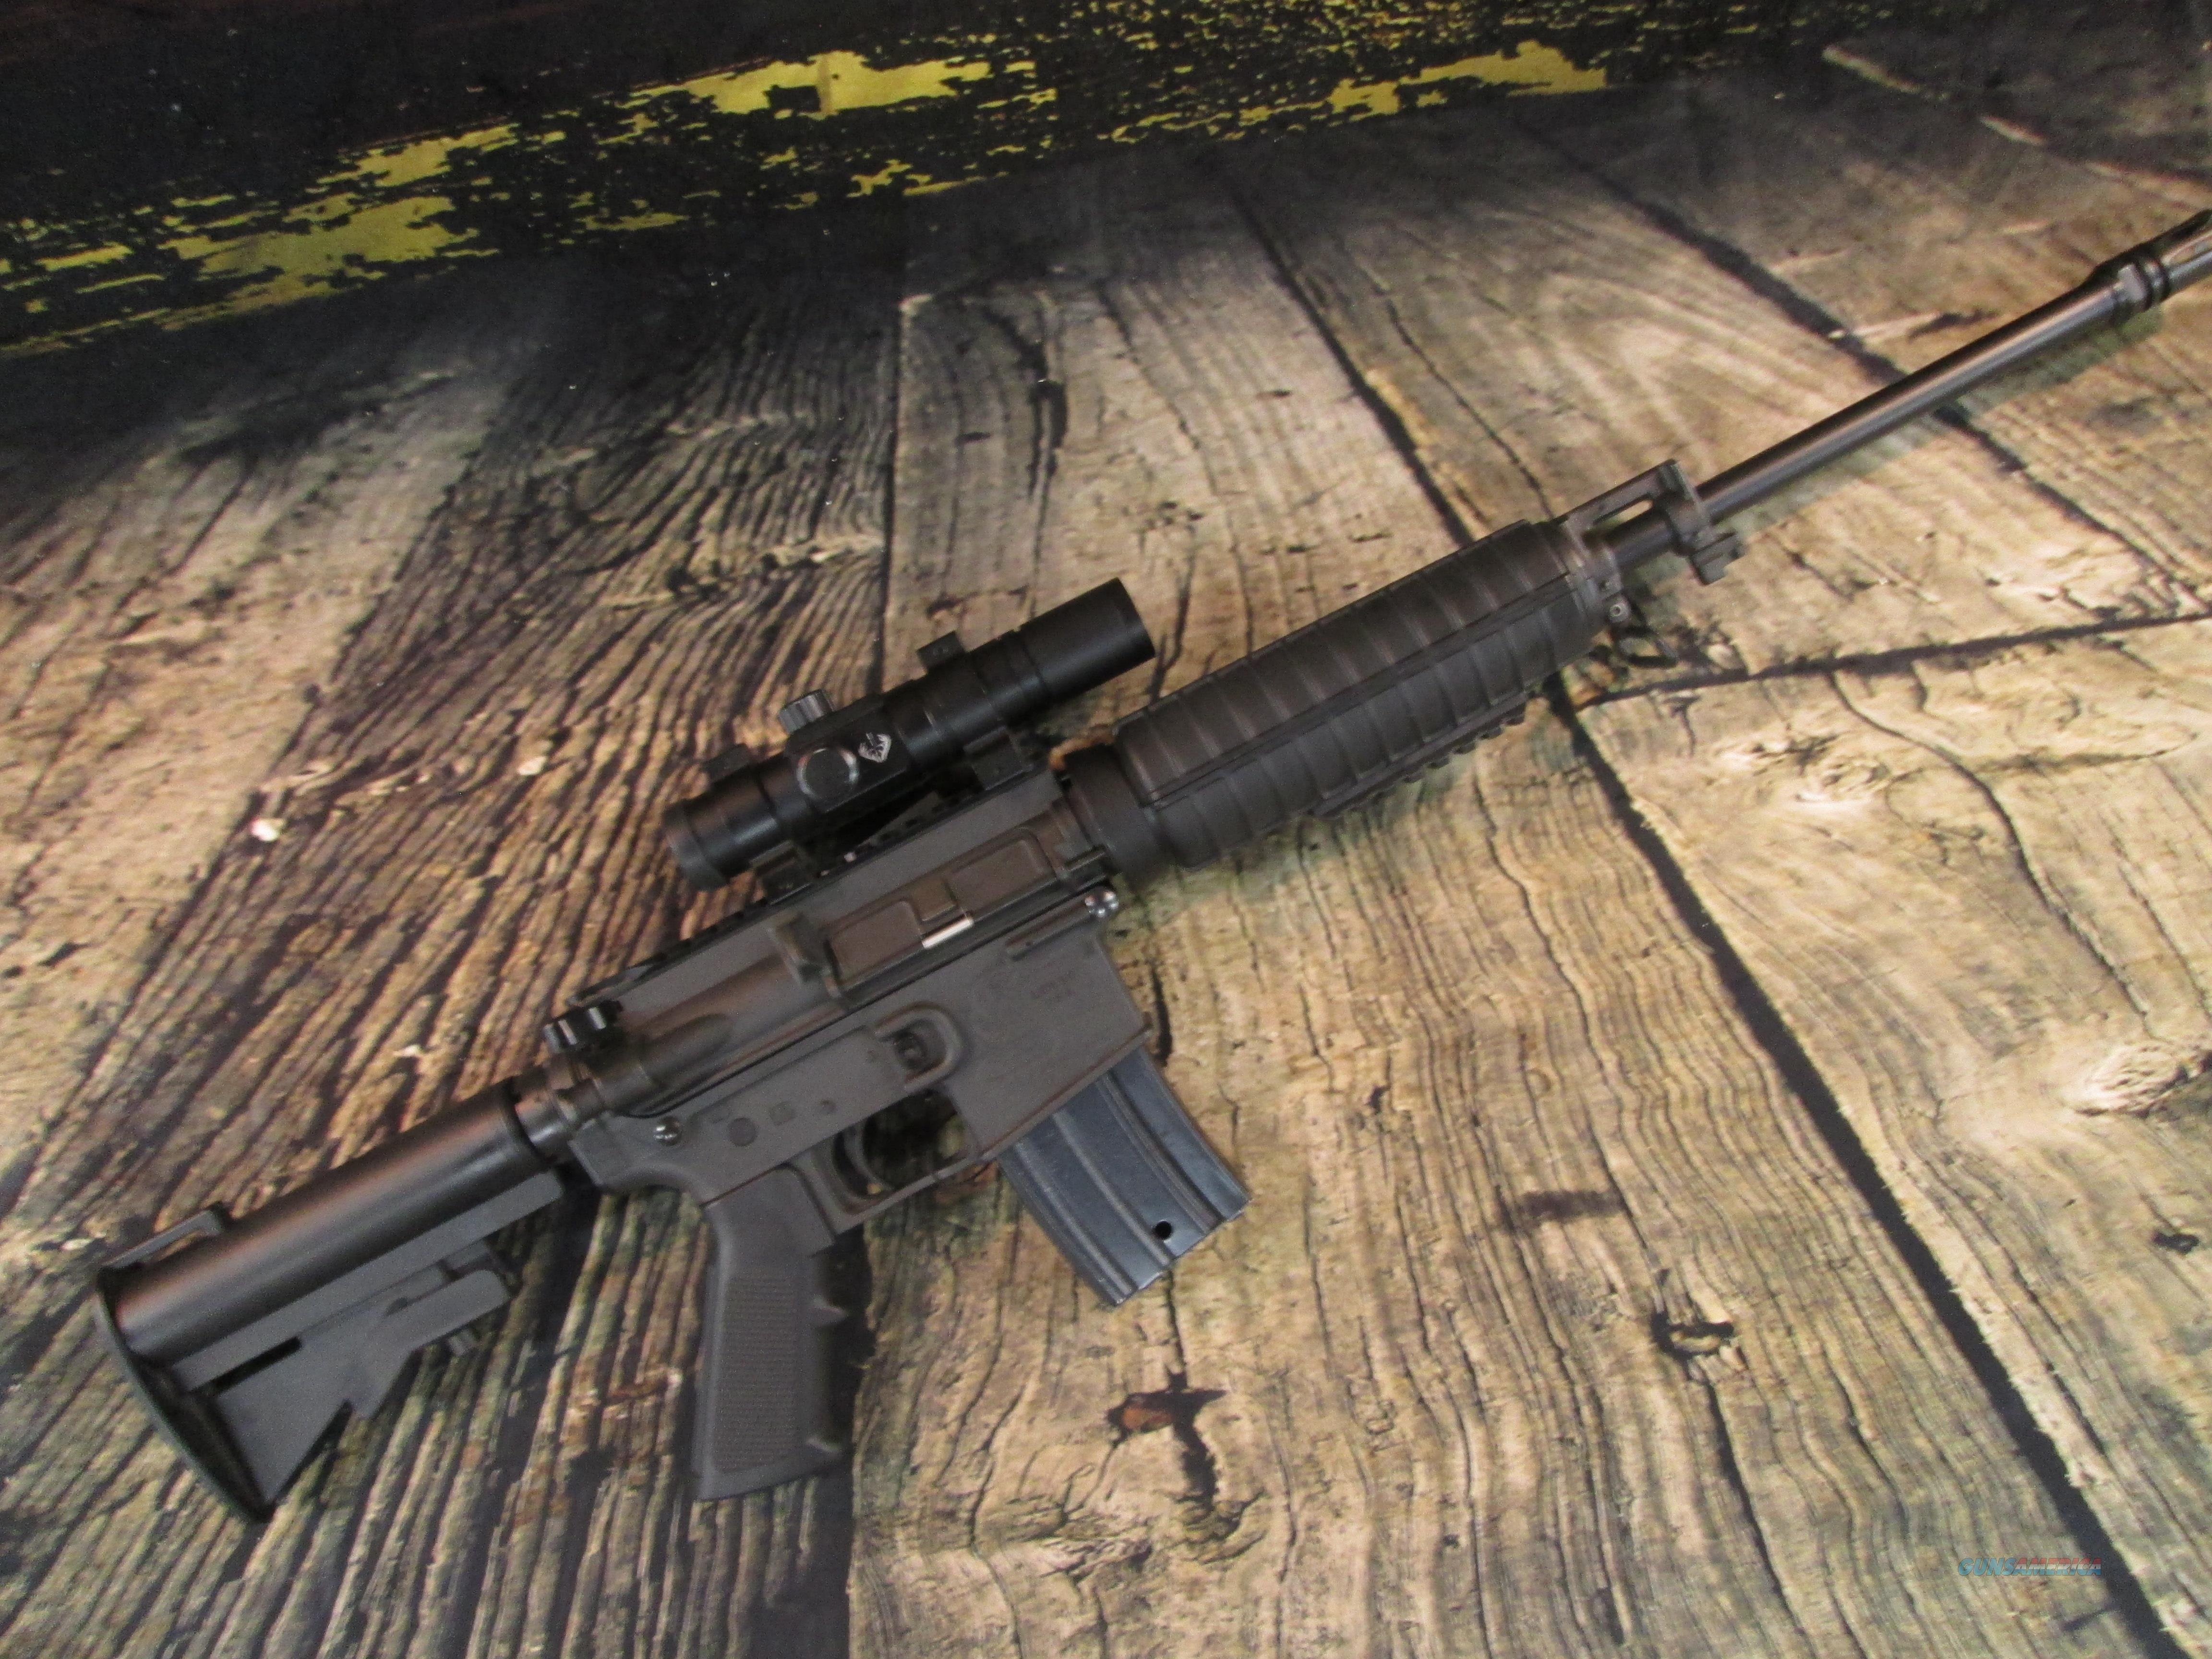 Bushmaster Carbon 15 AR-15 223/5.56 Used (65055)  Guns > Rifles > Bushmaster Rifles > Complete Rifles